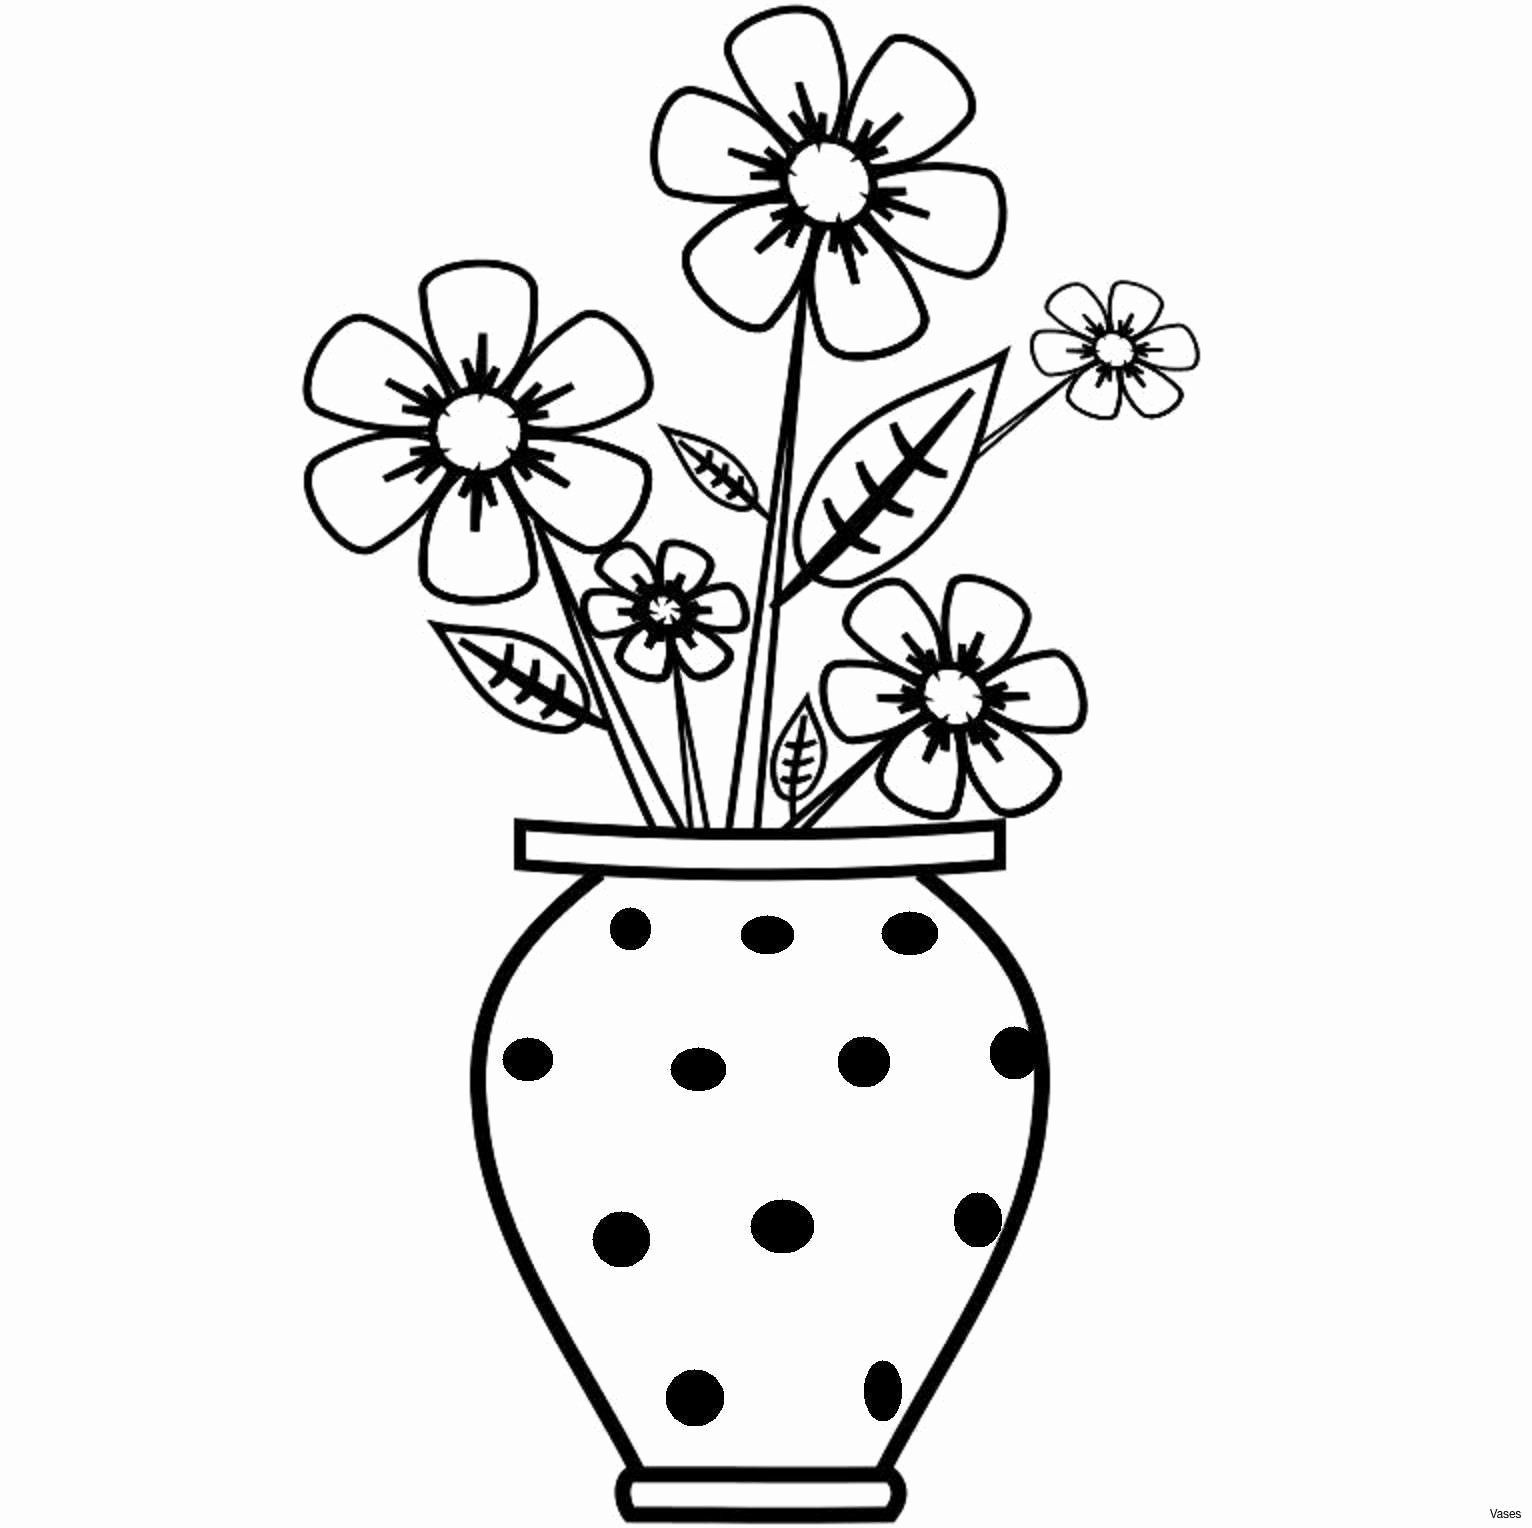 Coloring Flowers Roses Elegant Best Single Rose Coloring Page Nocn Flower Drawing For Kids Easy Flower Drawings Flower Vase Drawing